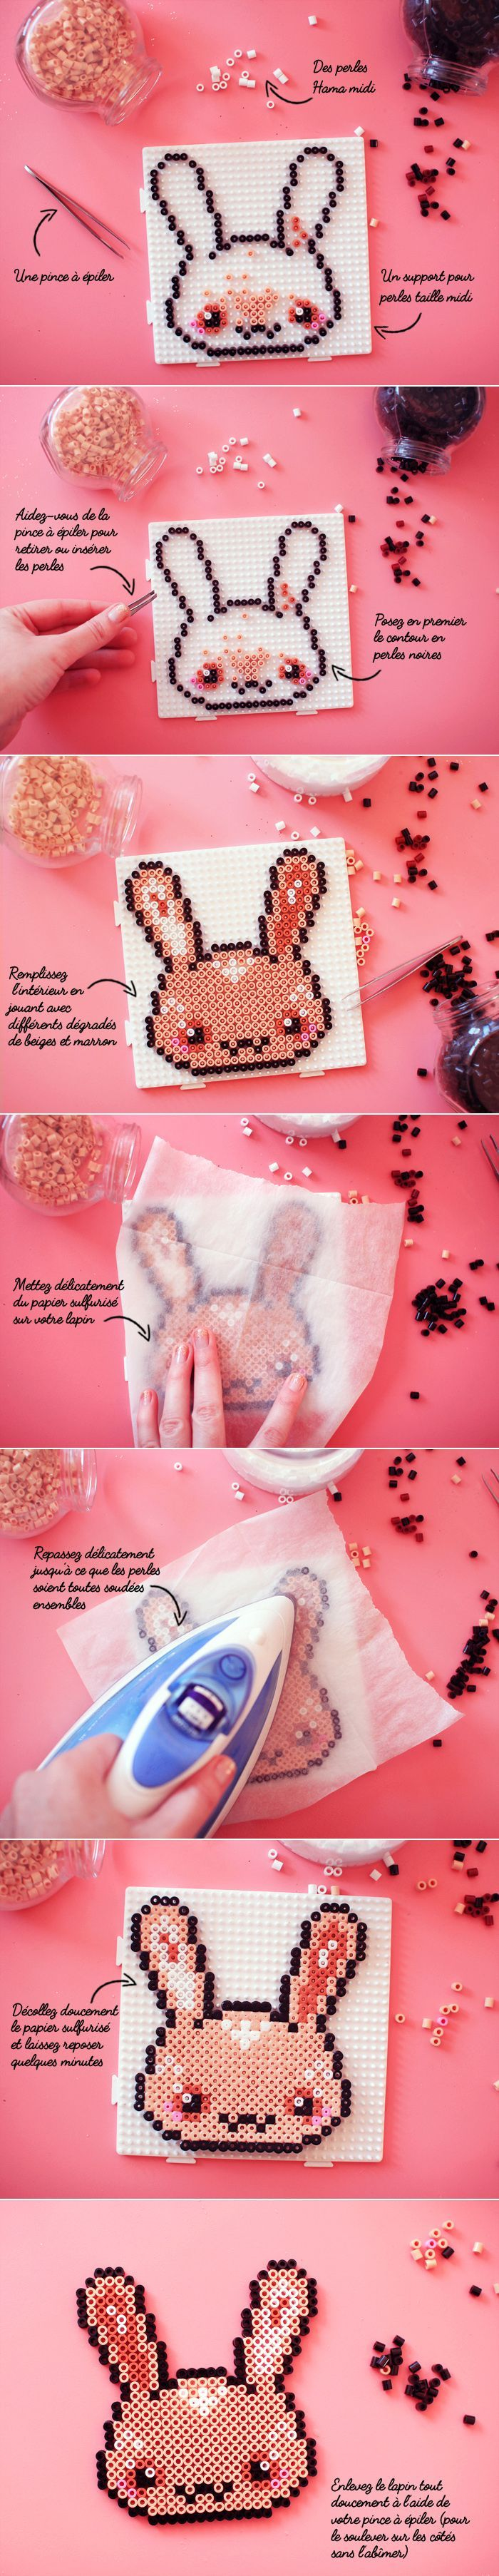 Hama Perler Bead Bunny: